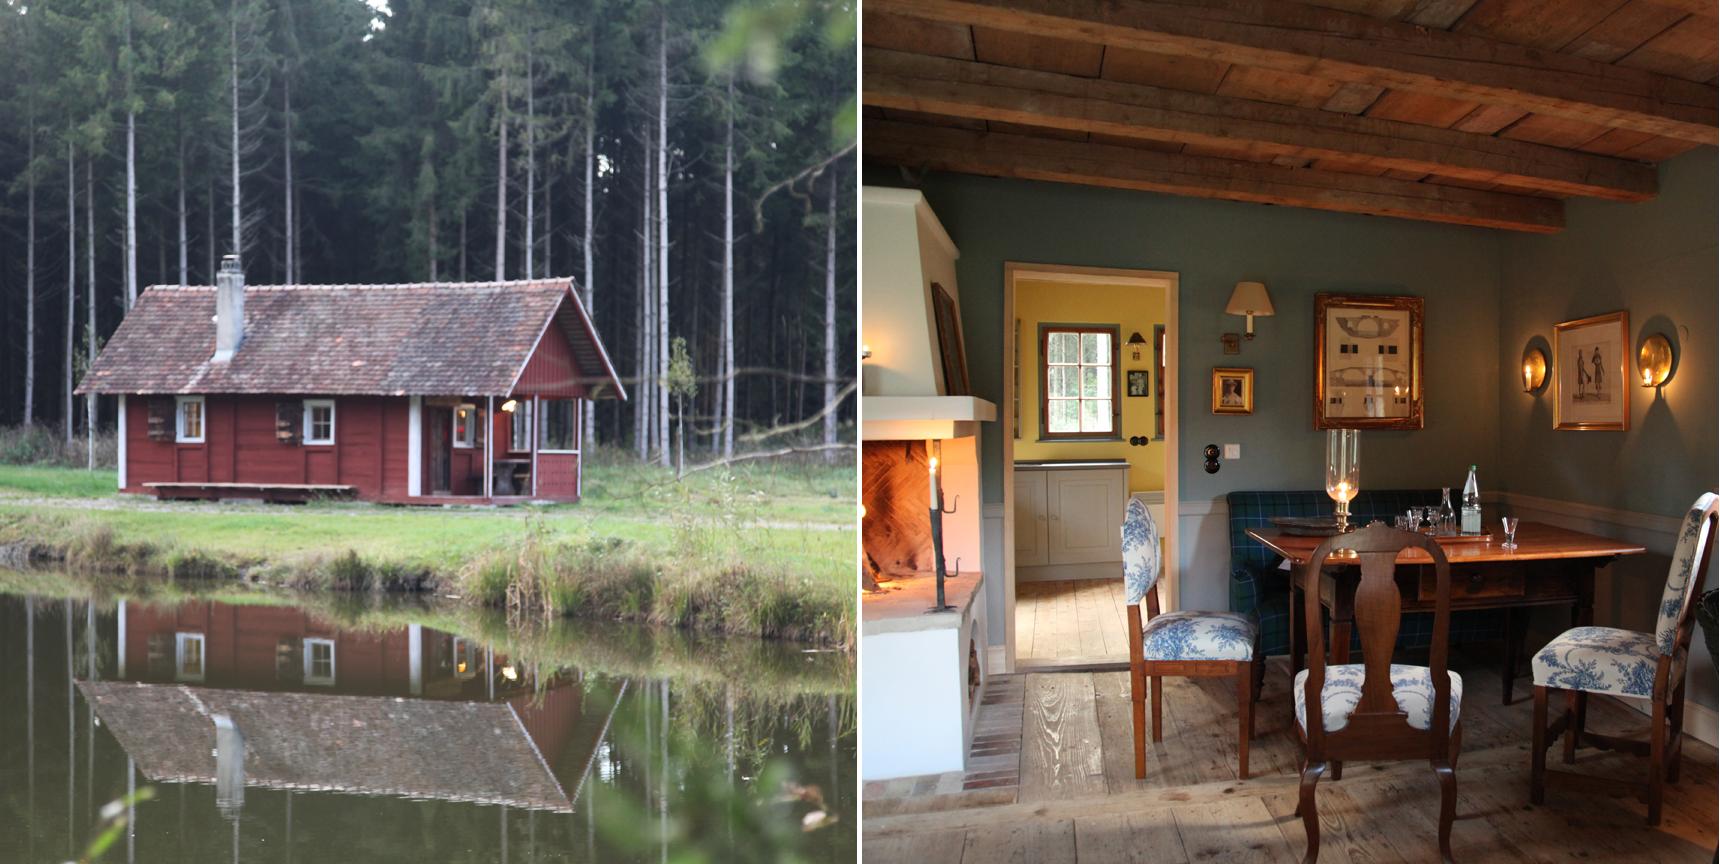 landhaus style pic. Black Bedroom Furniture Sets. Home Design Ideas